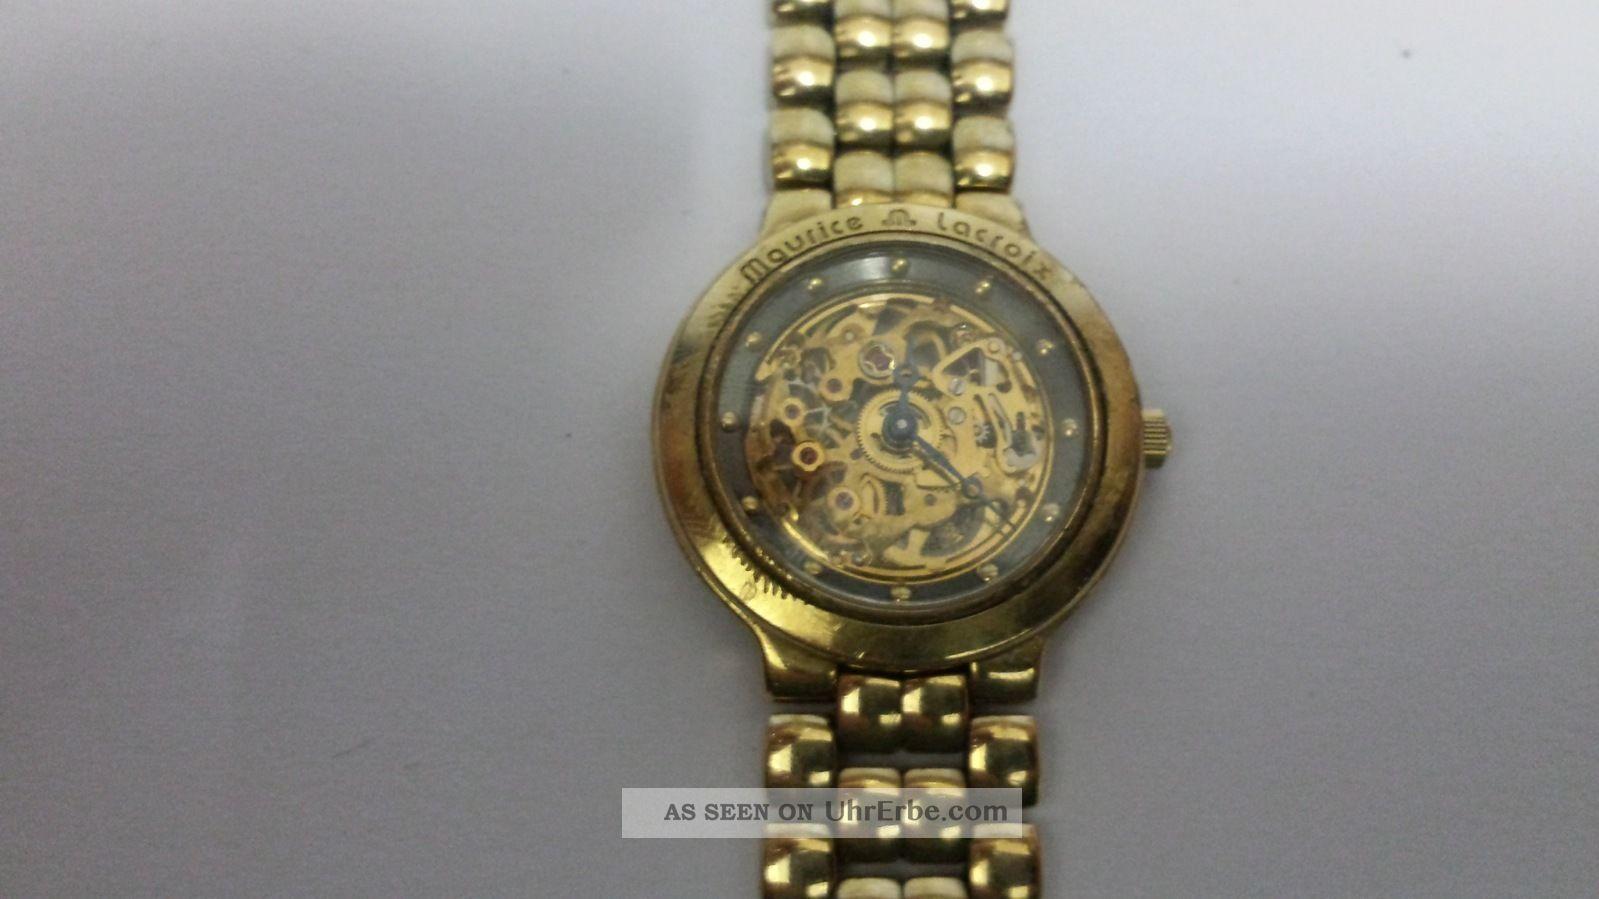 Maurice Lacroix Squelette Armbanduhren Bild